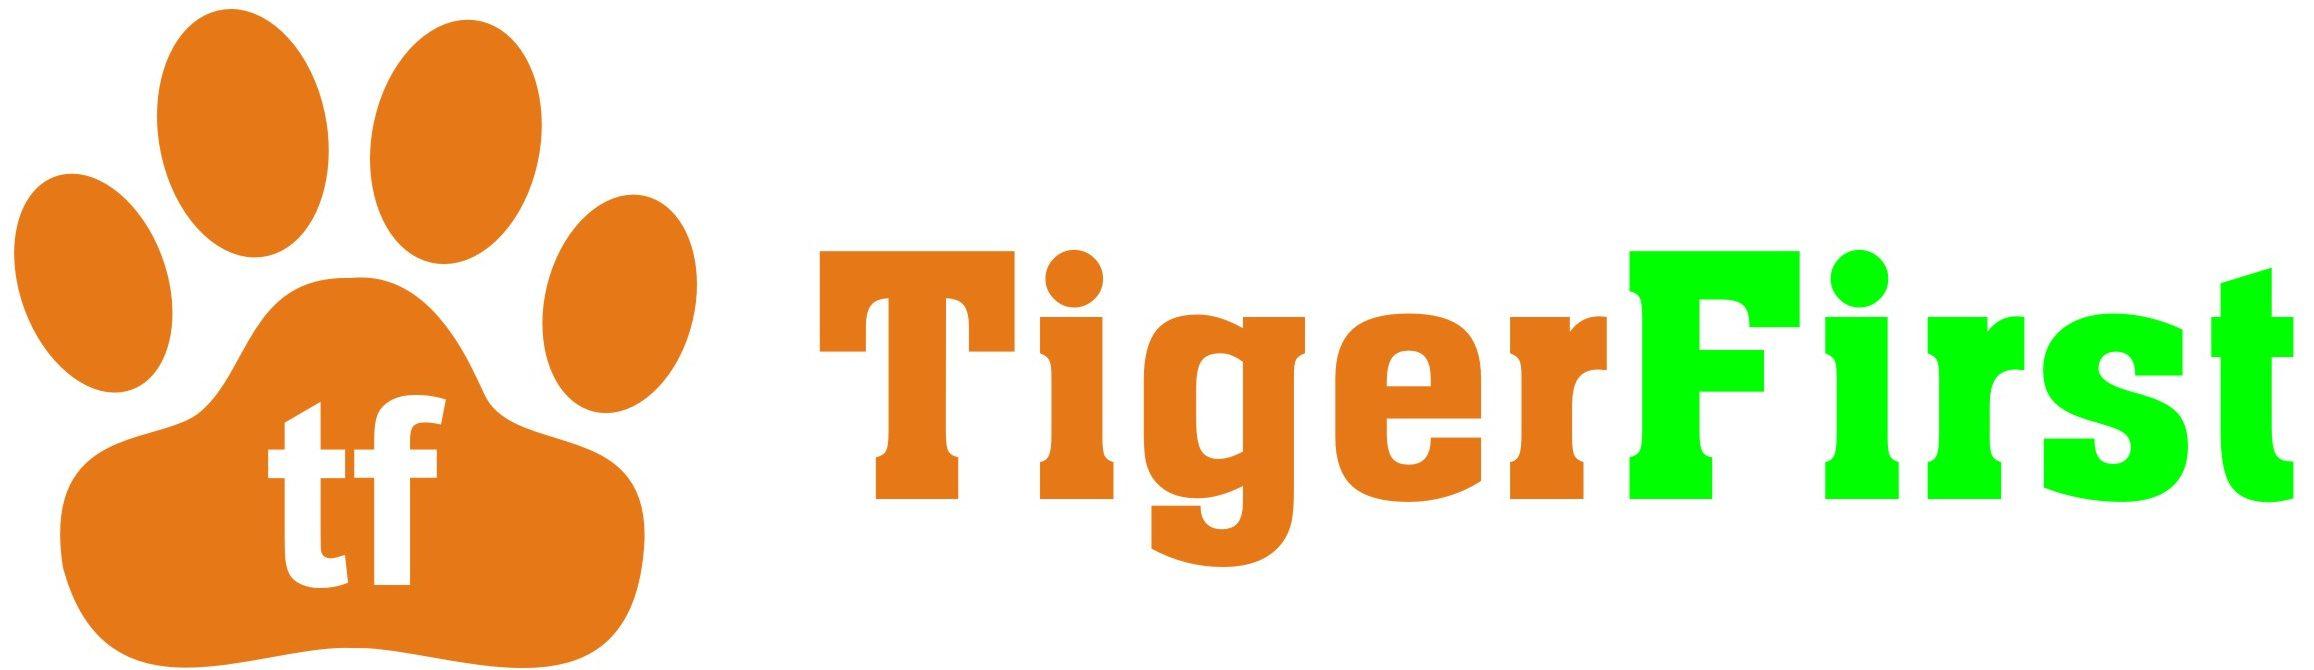 Tigerfirst